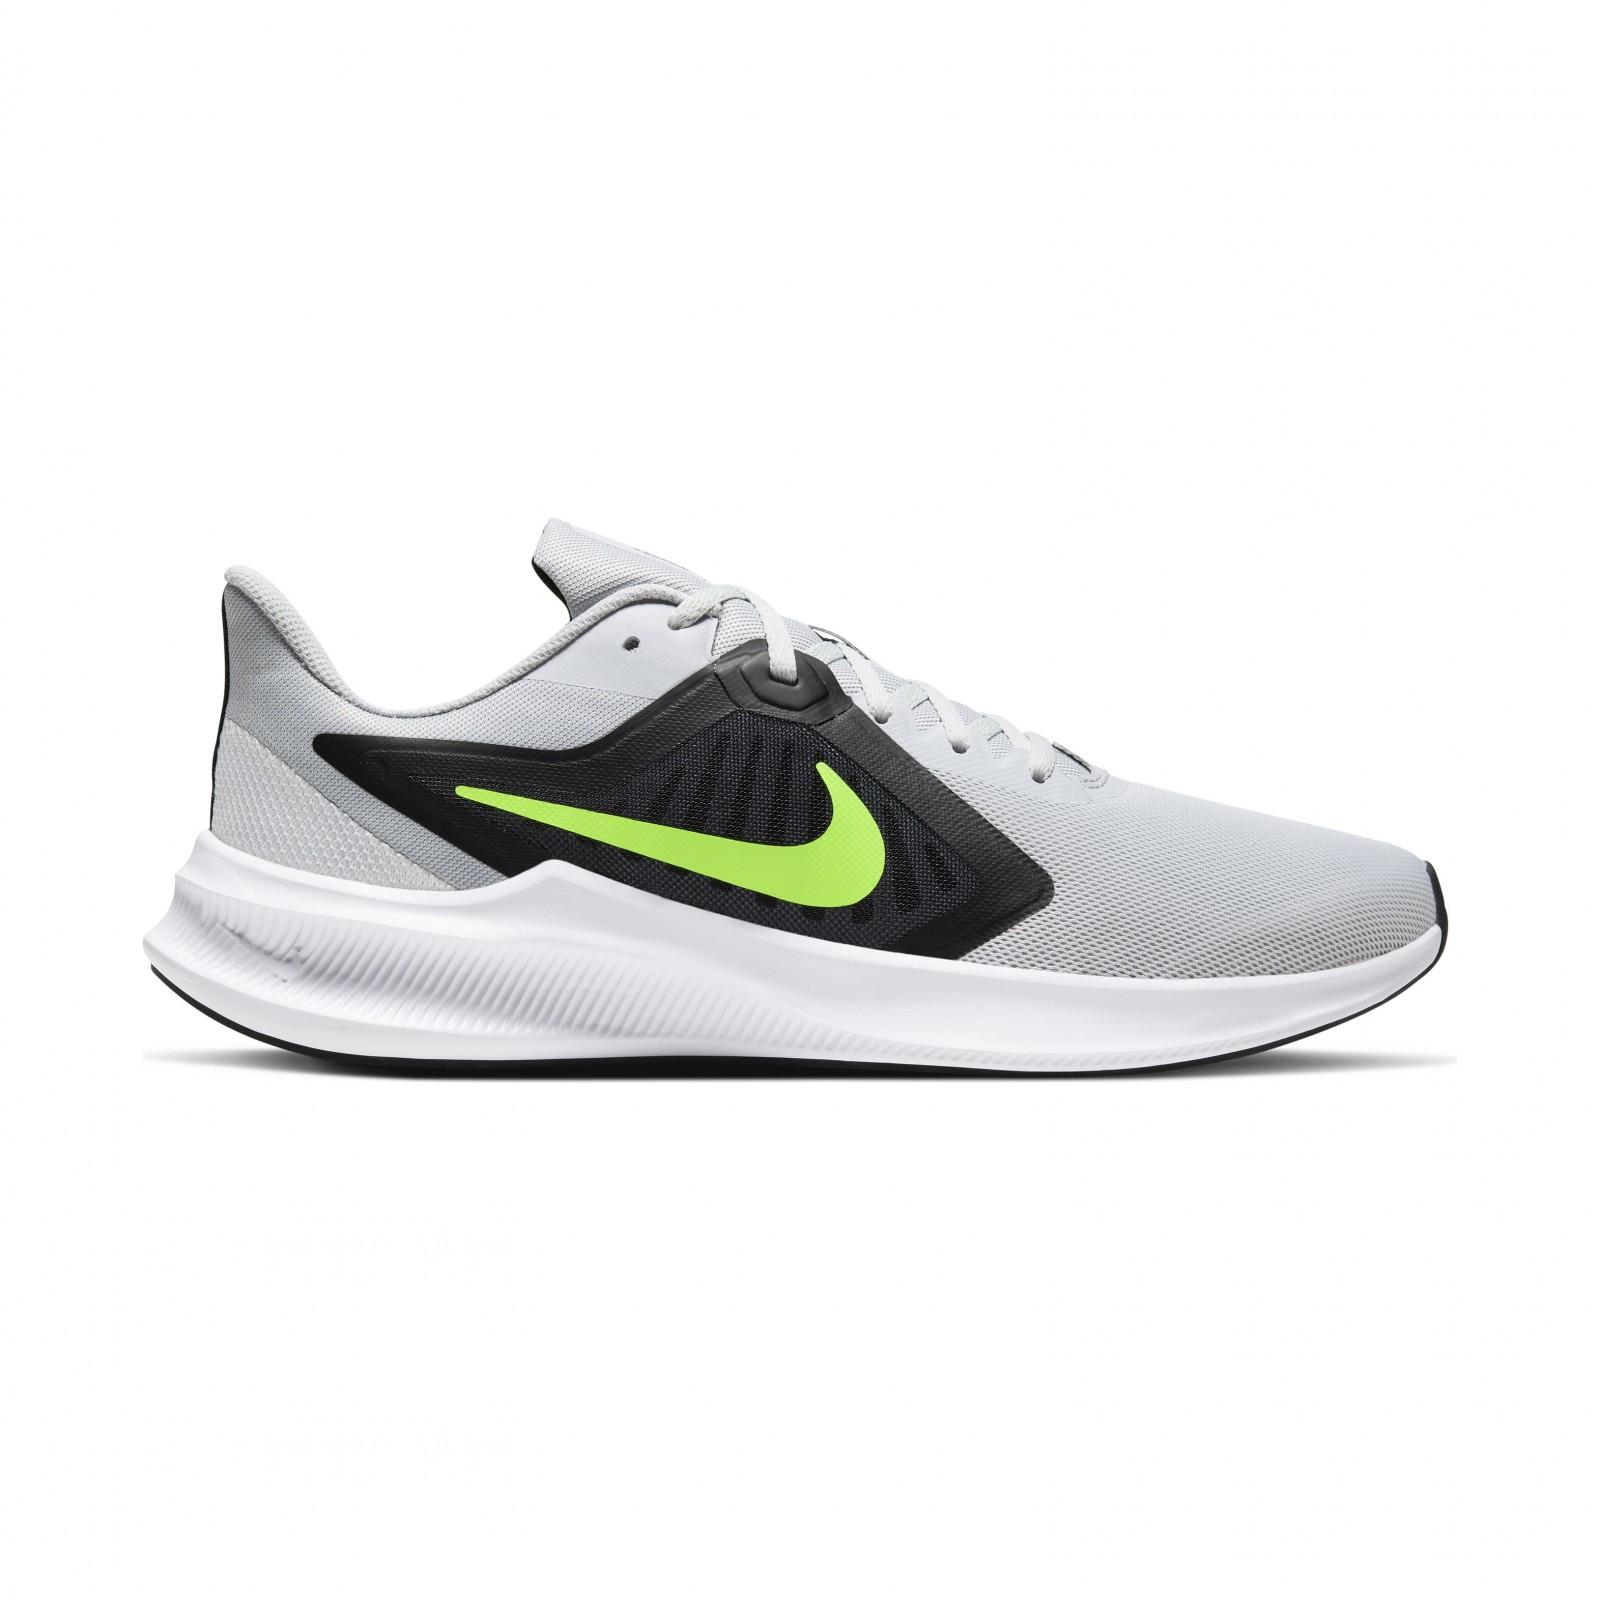 Nike Downshifter 10 GREY FOG/VOLT-BLACK-WHITE